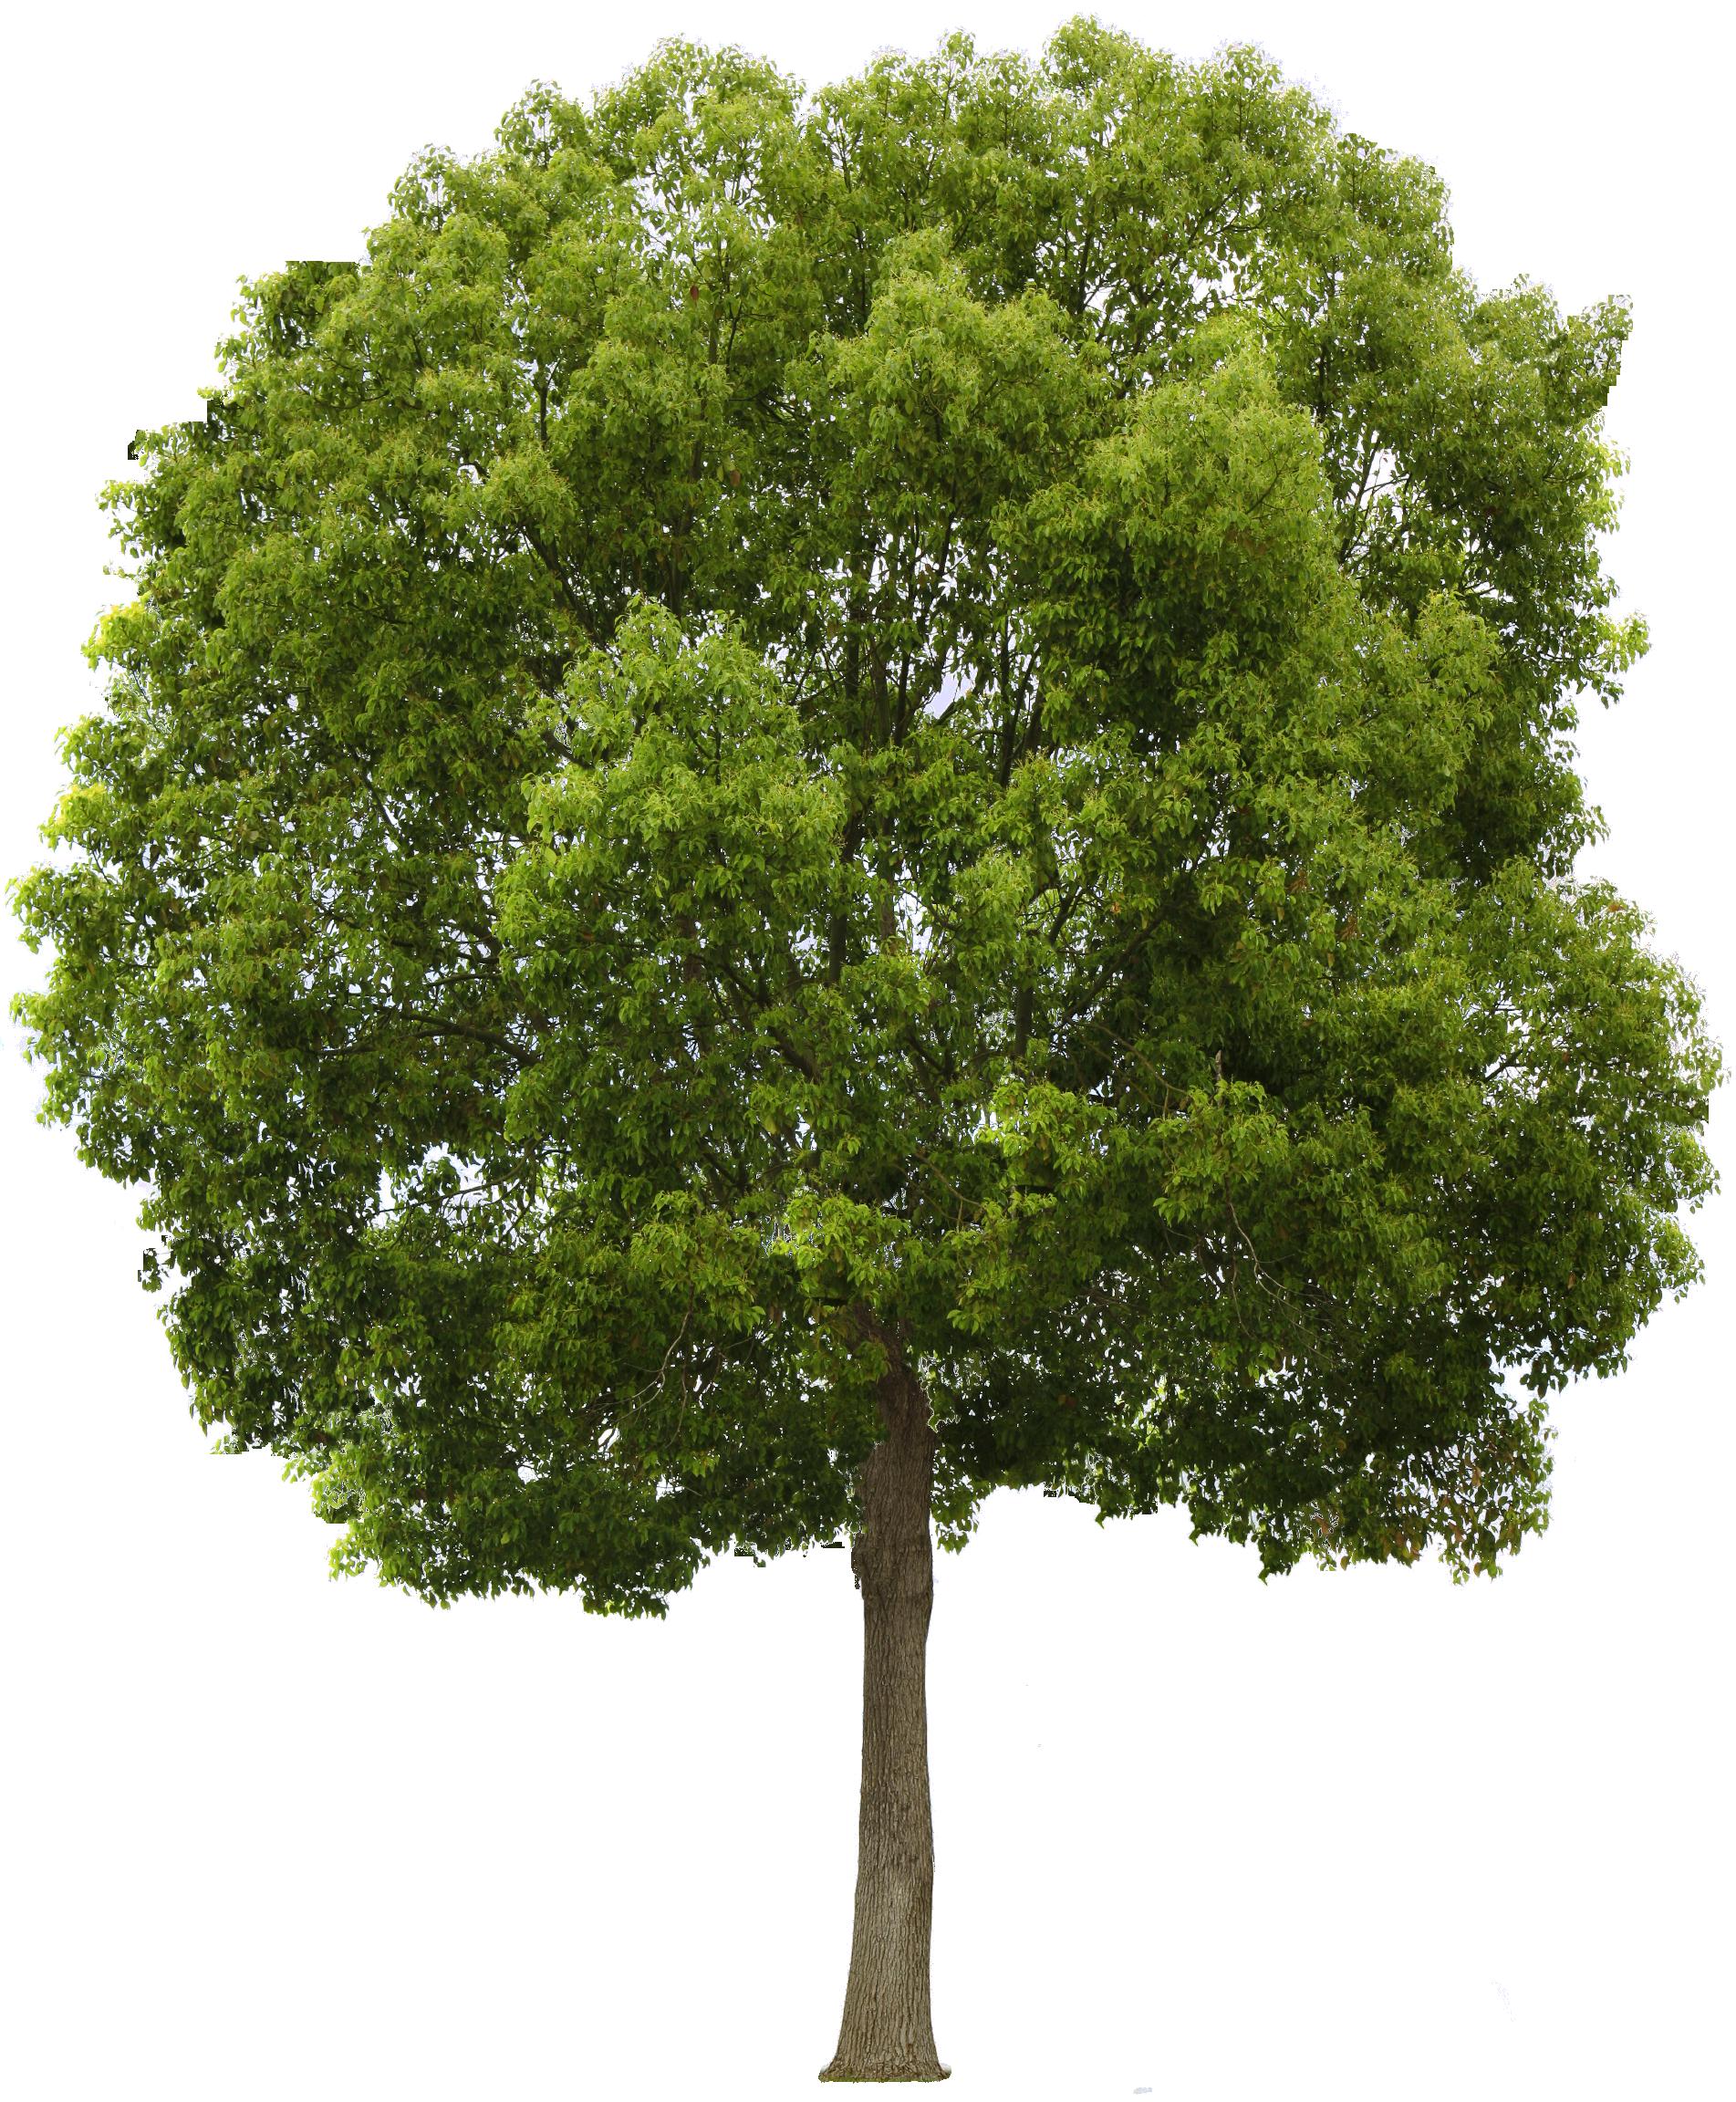 Image result for tree | MI 377 Final | Pinterest | Master plan ... for Park Tree Png  55nar